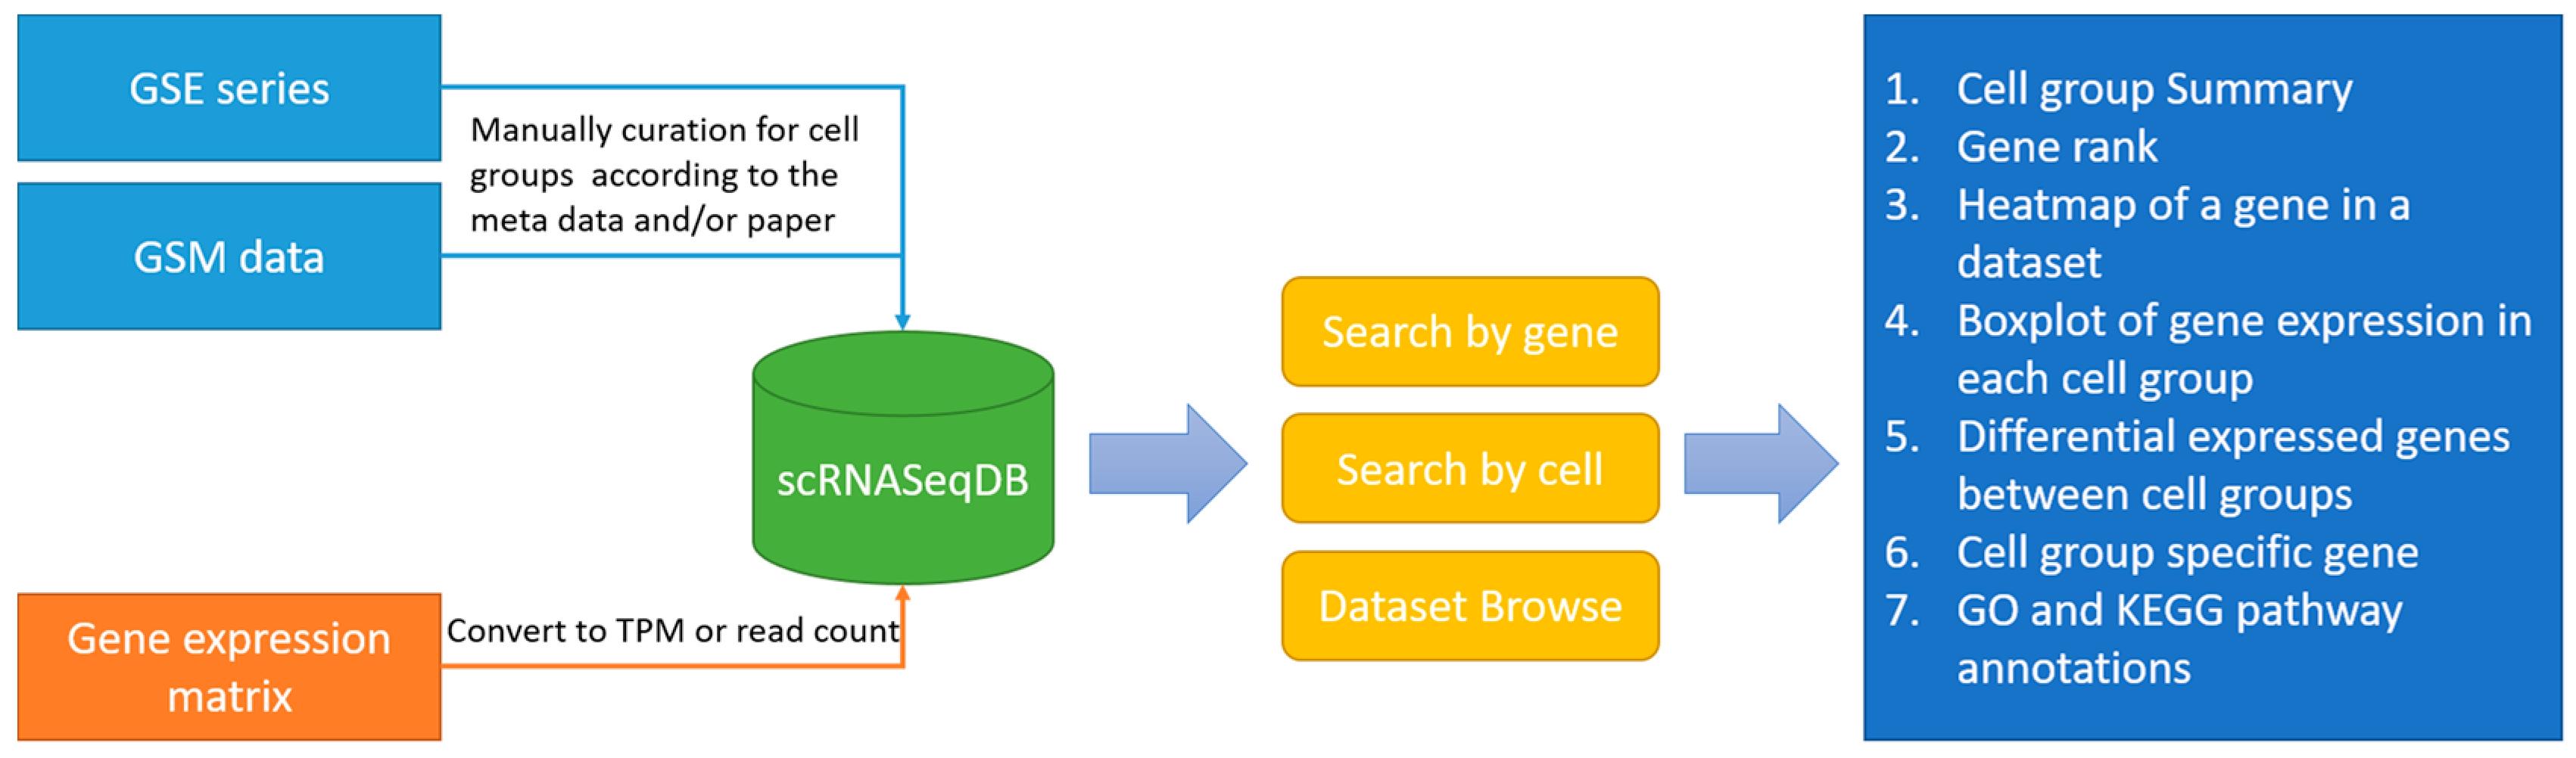 Genes | Free Full-Text | scRNASeqDB: A Database for RNA-Seq Based